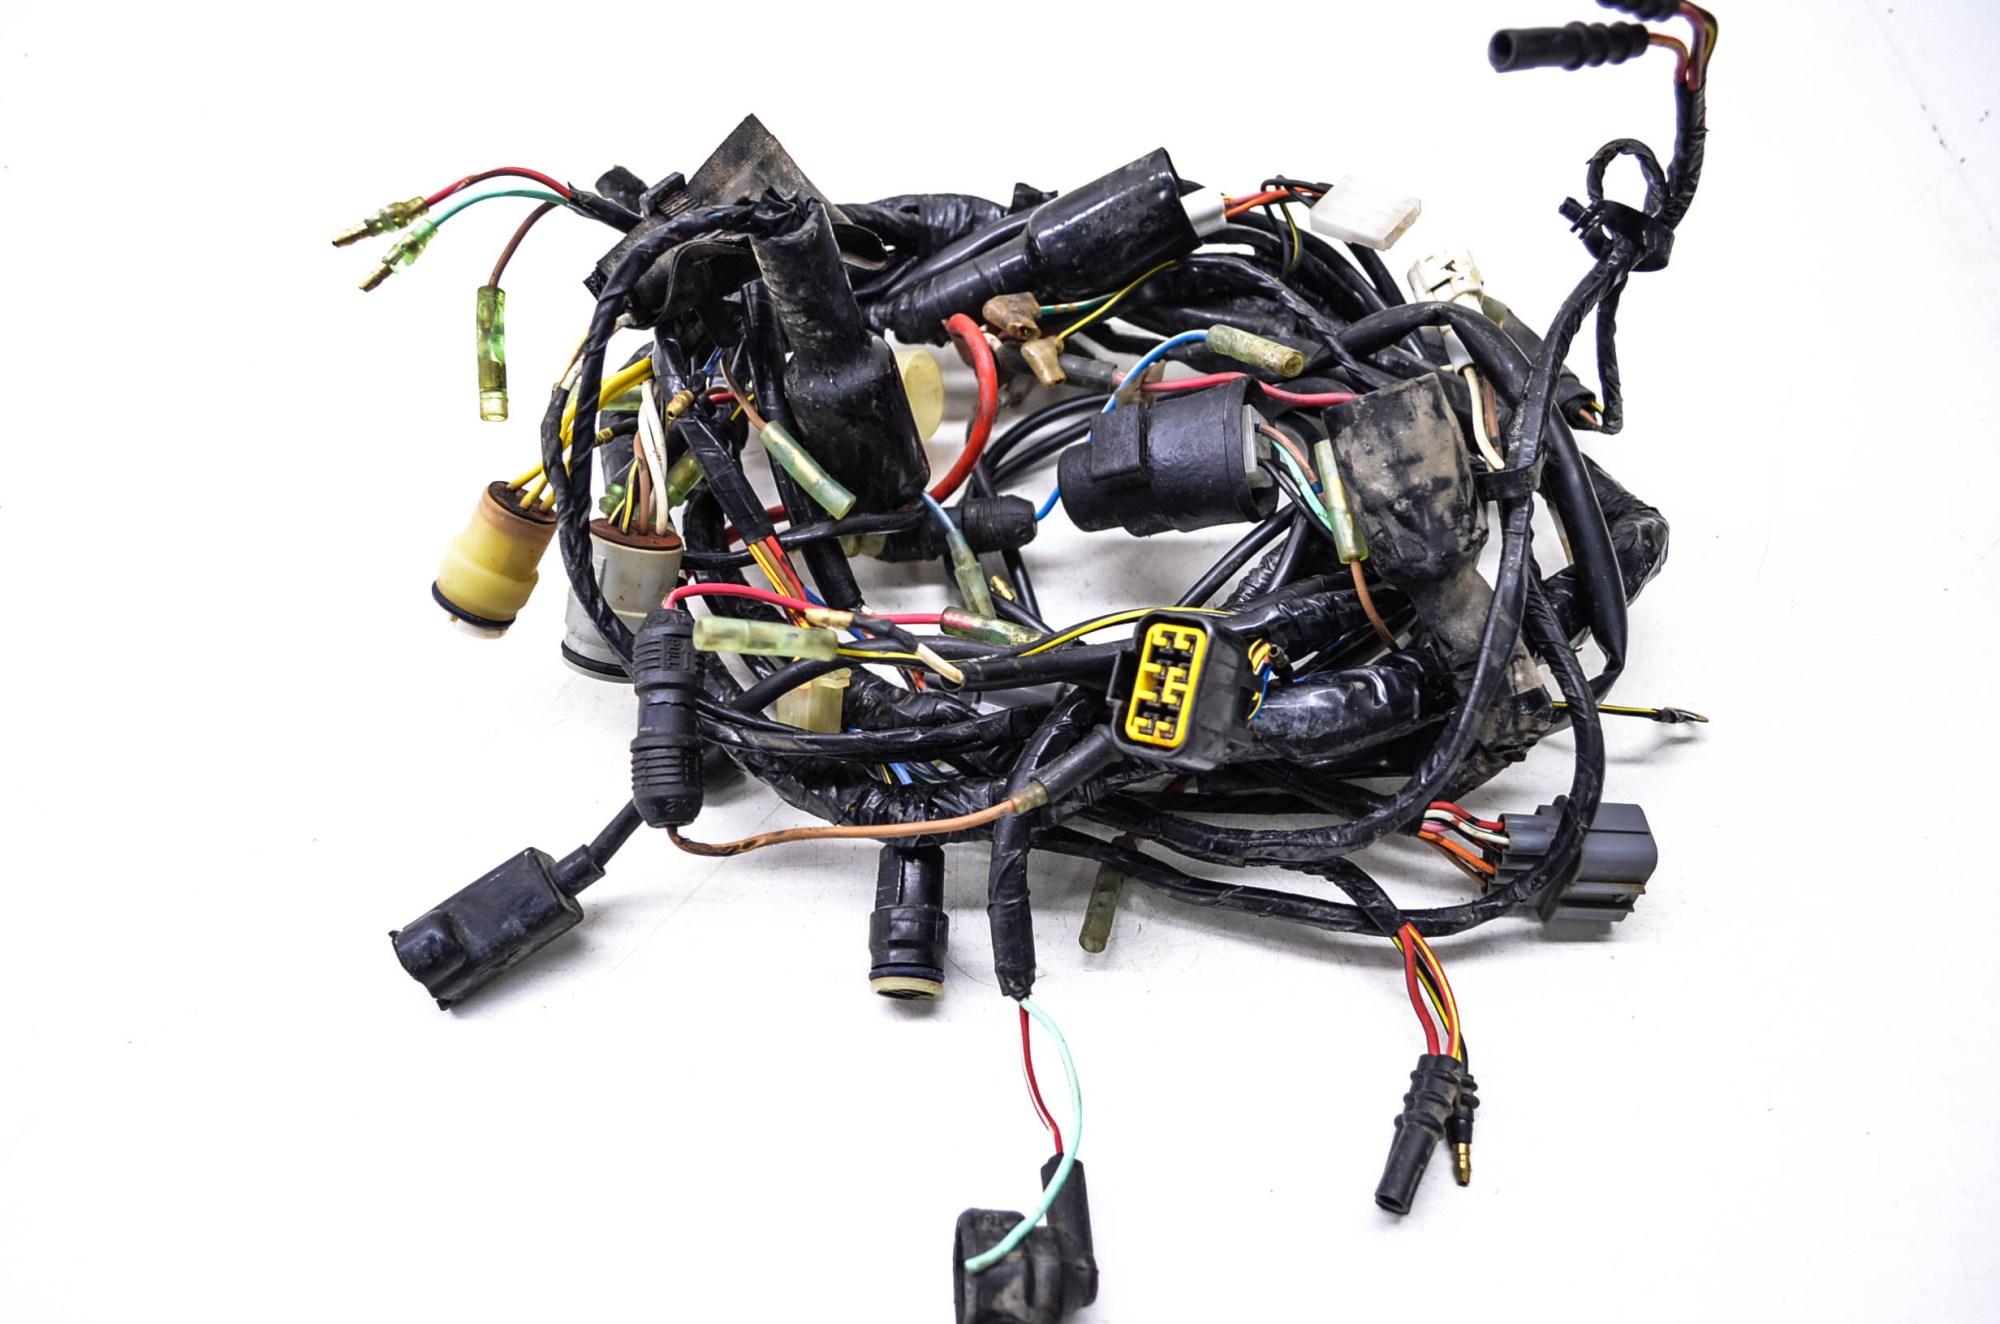 hight resolution of 01 kawasaki prairie 400 4x4 wire harness electrical wiring kvf400 ebay 1998 kawasaki prairie 400 wiring